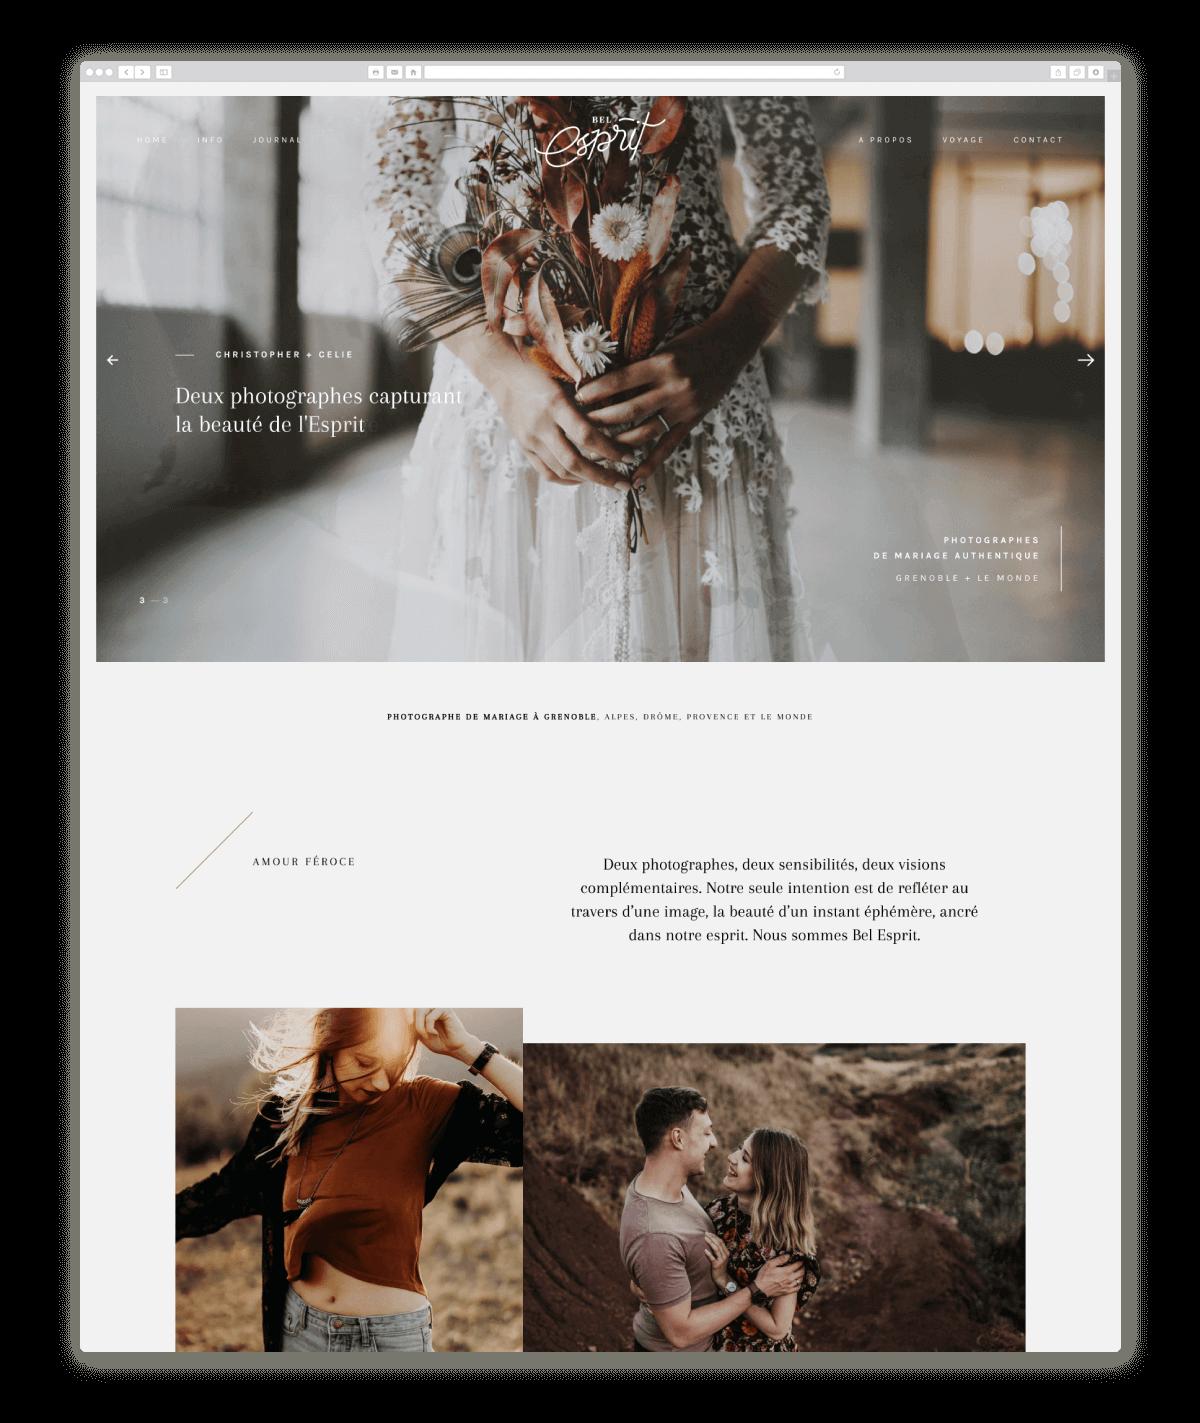 wedding photography website design belesprit.fr